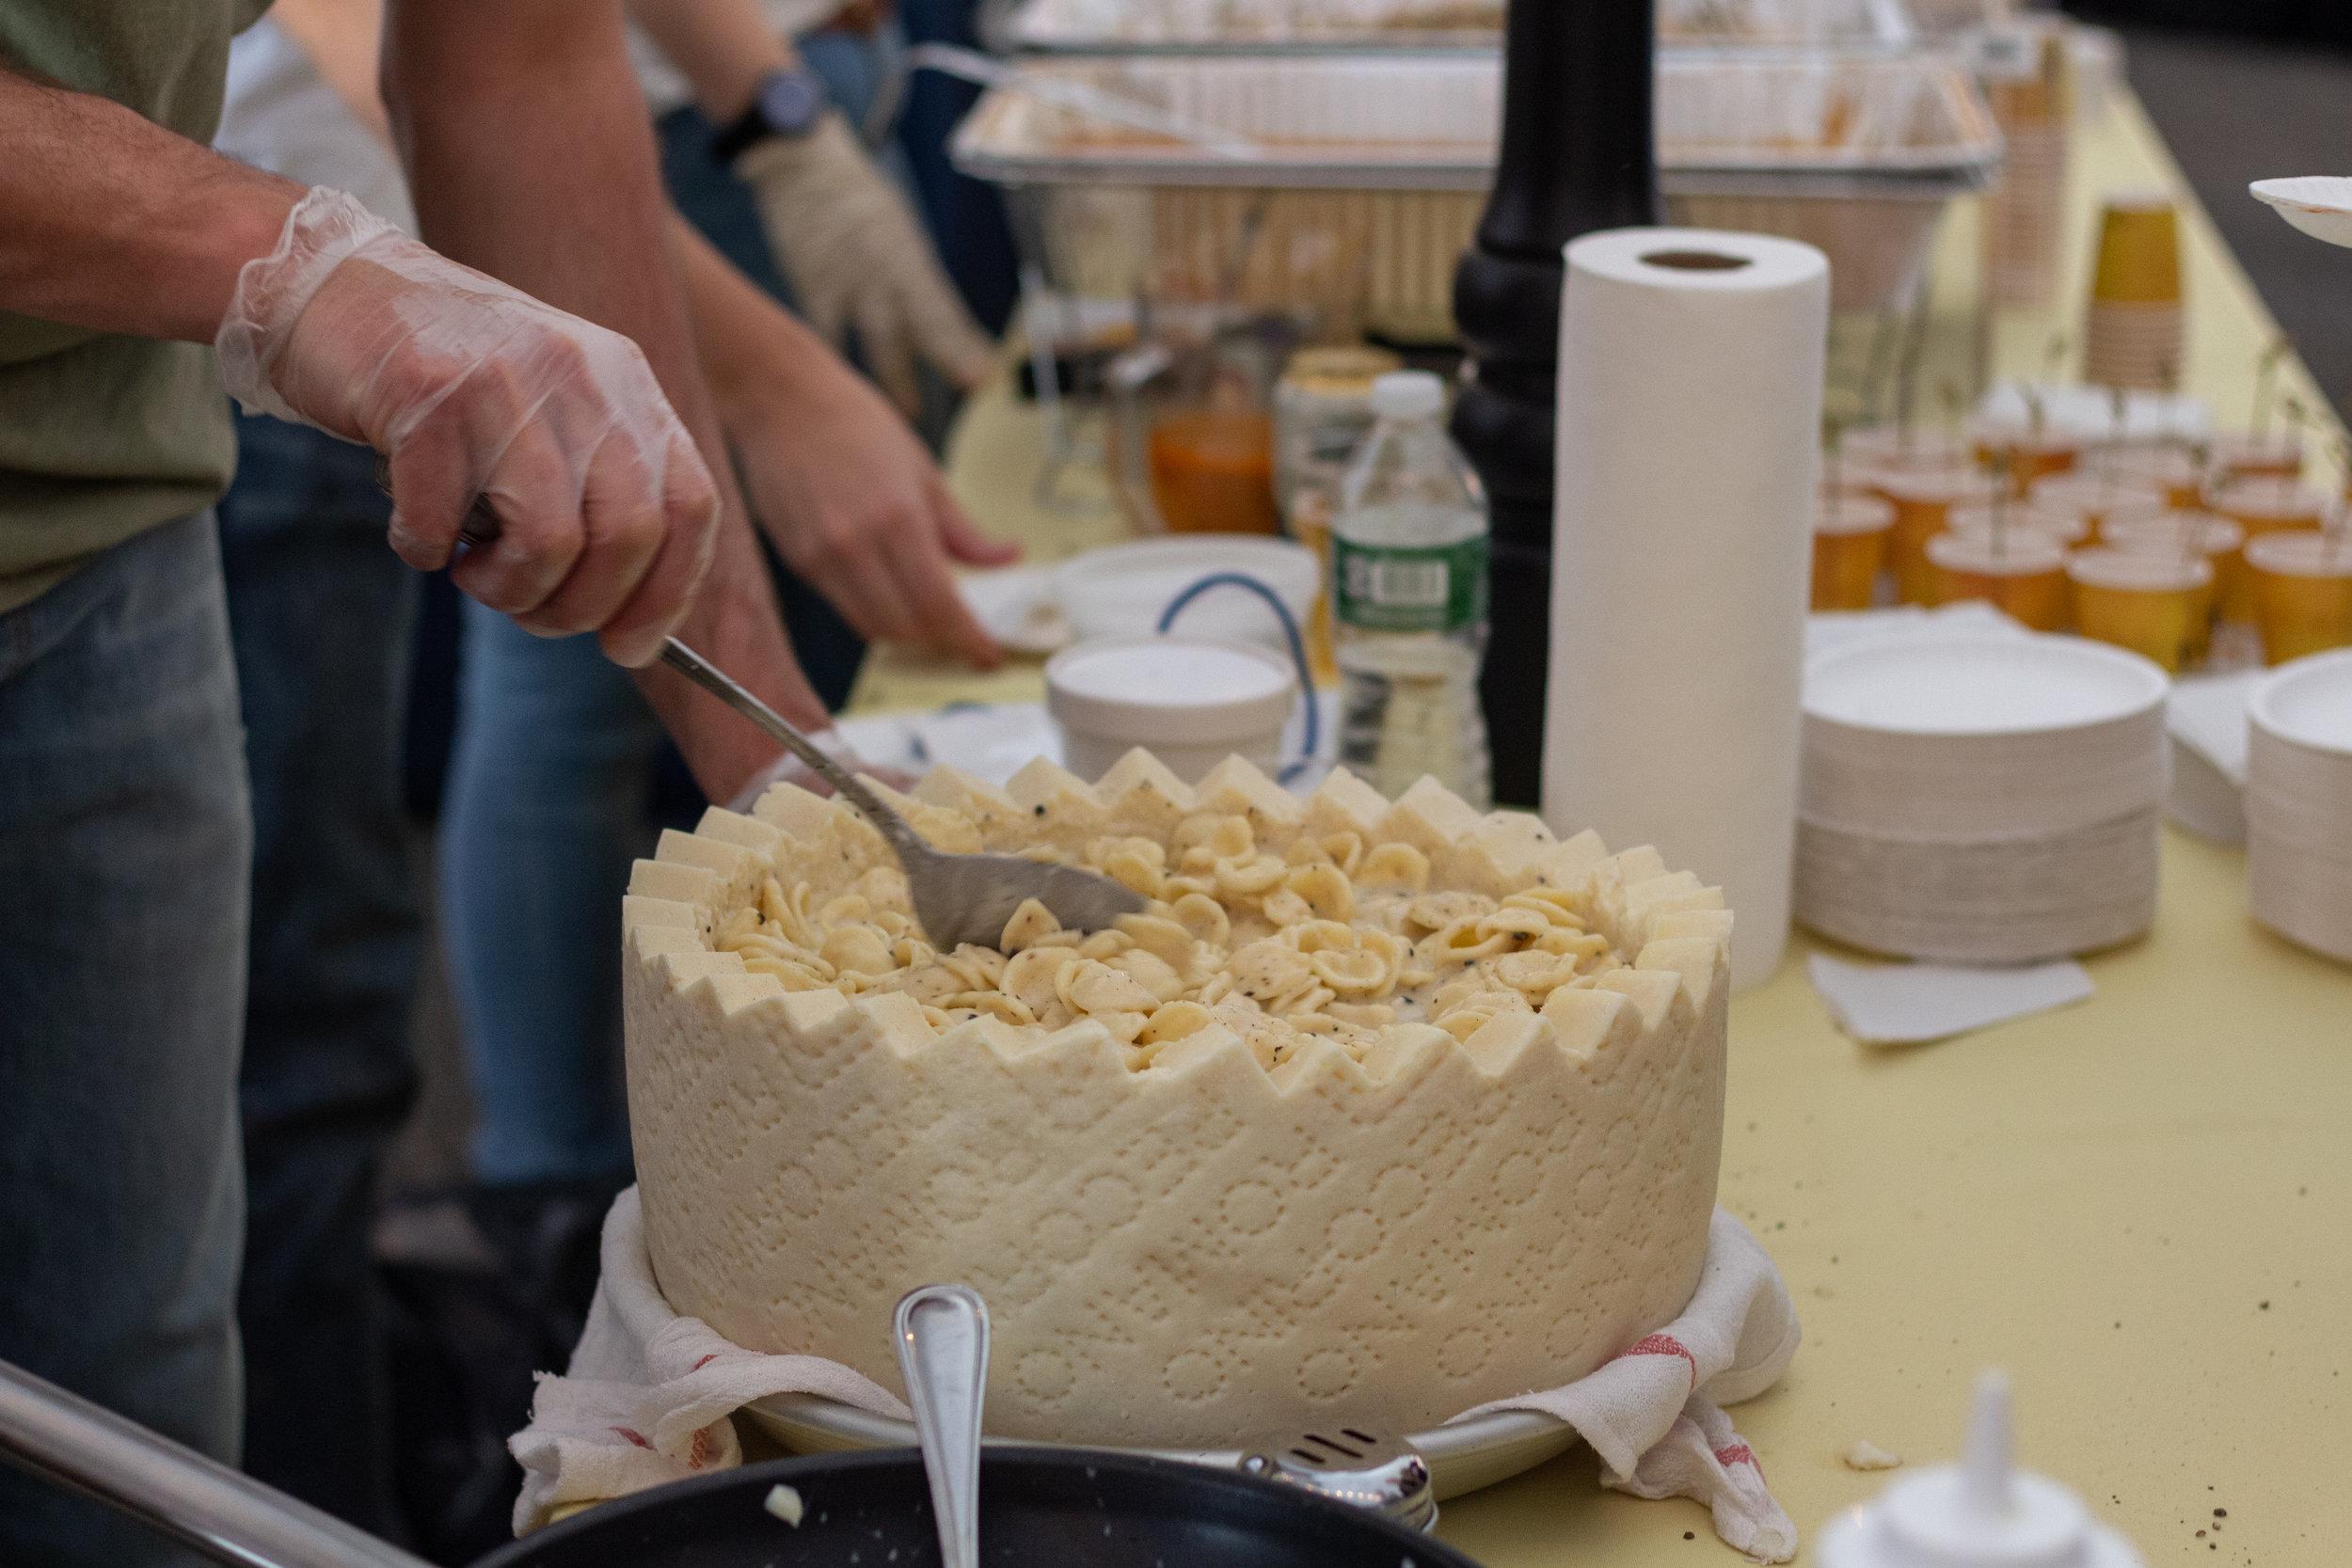 SoleLuna serves up some Instagram-ready pasta at the Taste of Sunnyside. Eagle photos by Jonathan Sperling.